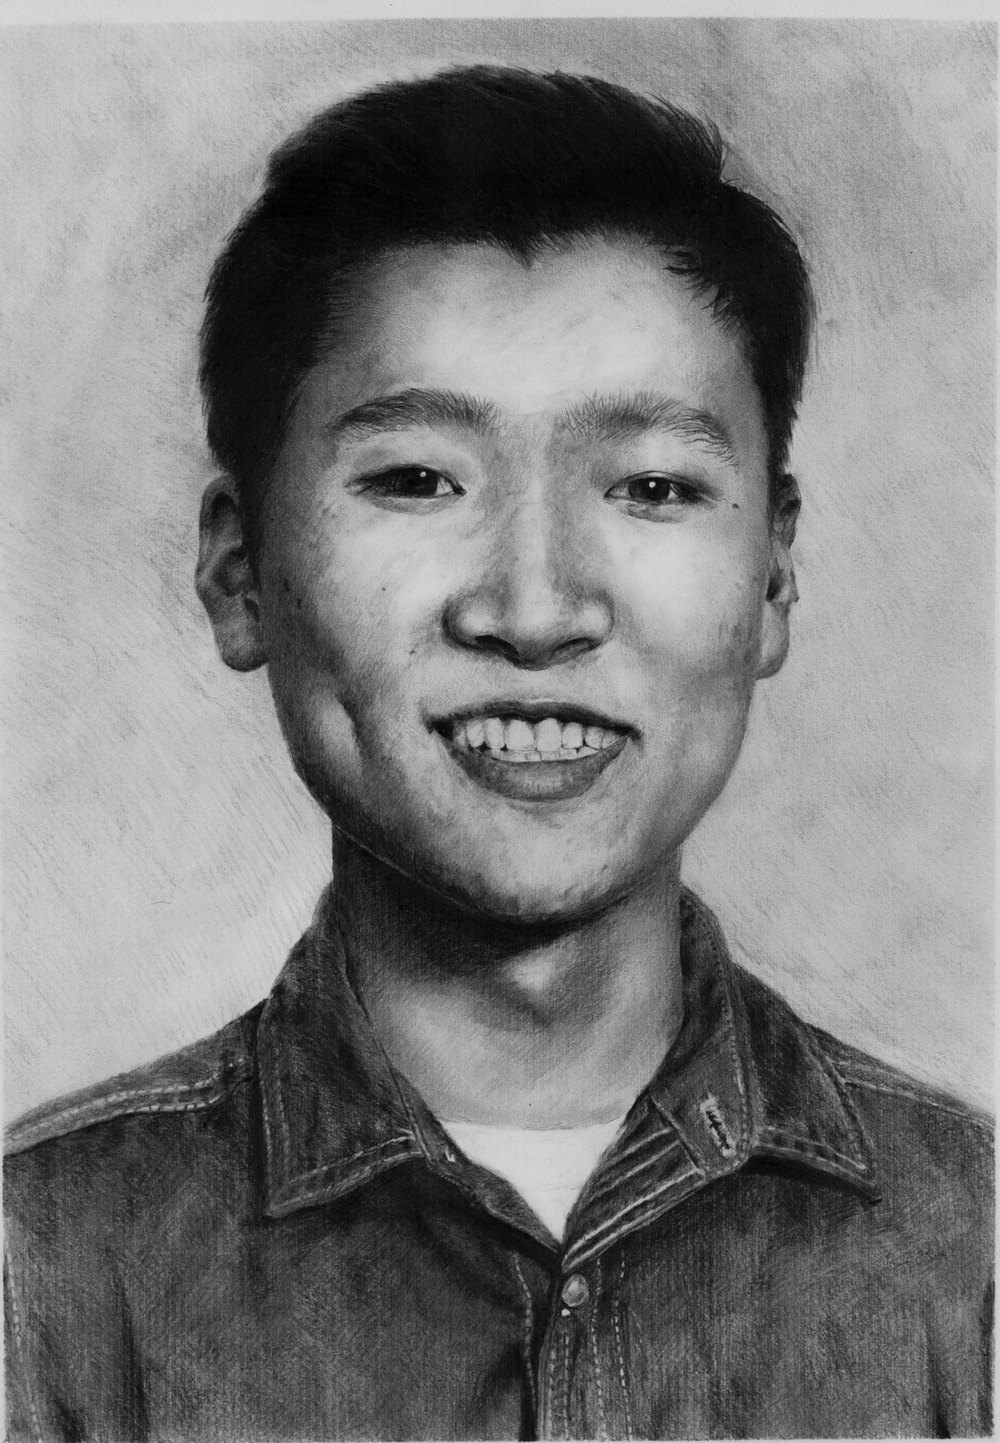 Tom Li, 17